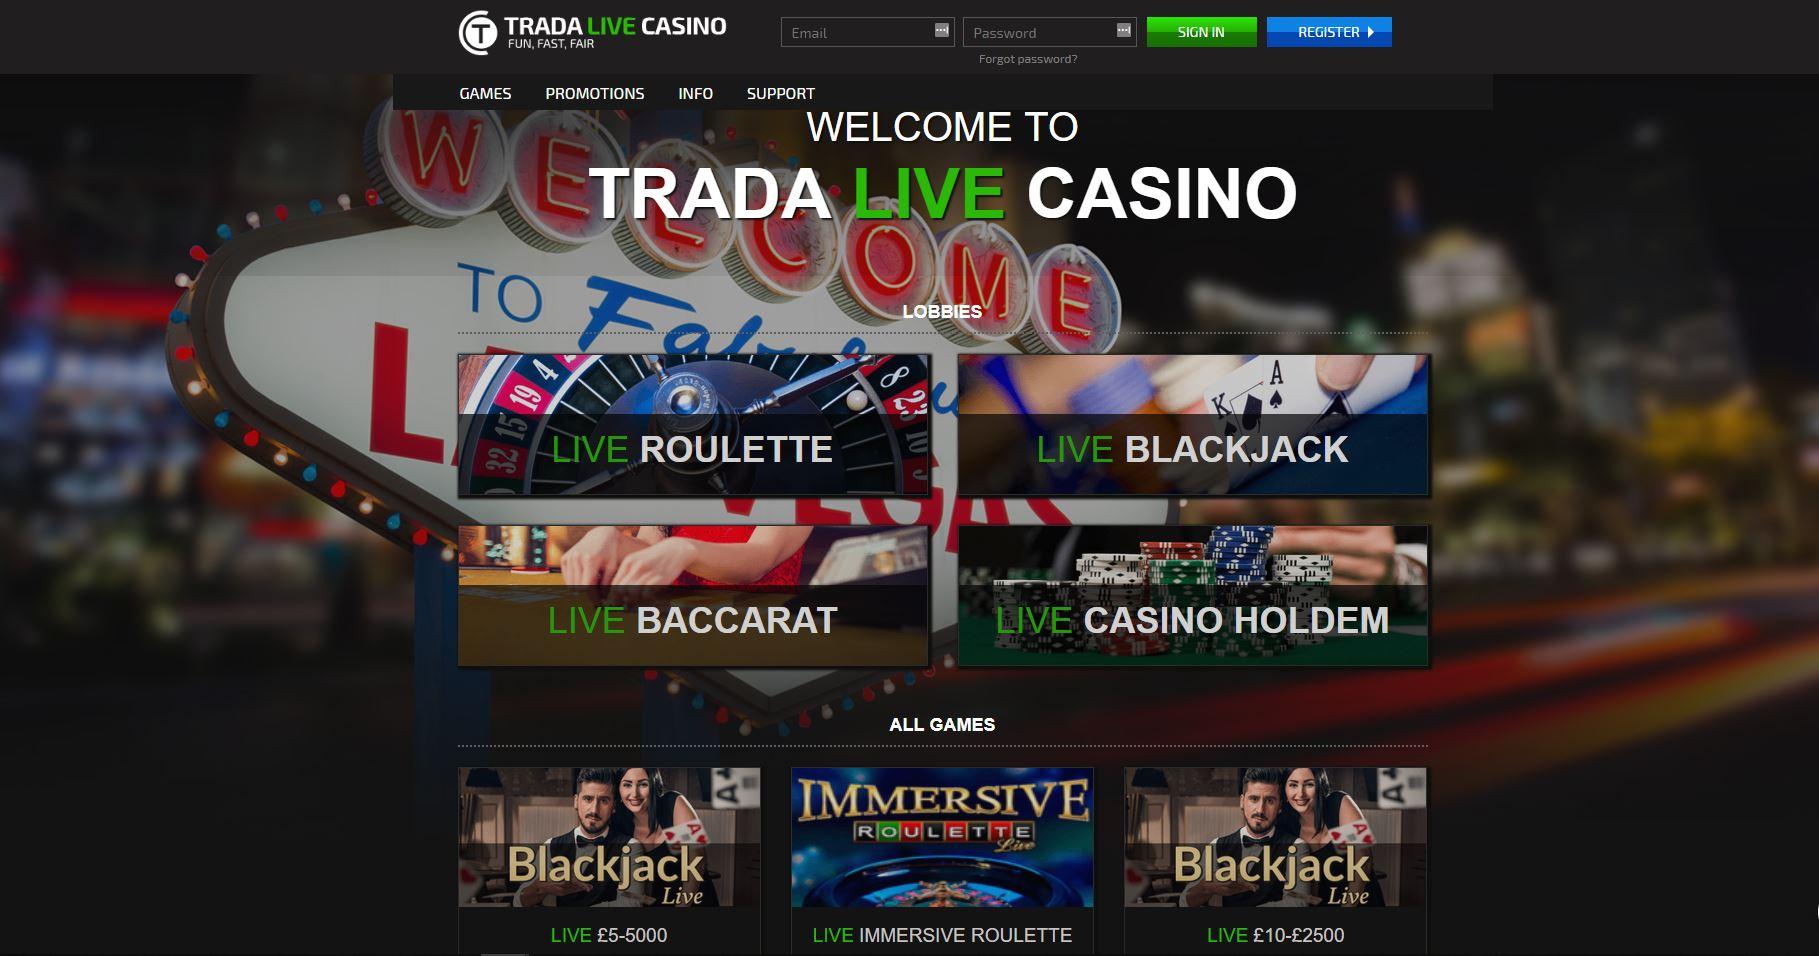 TradaCasino Trada Casino Lobby